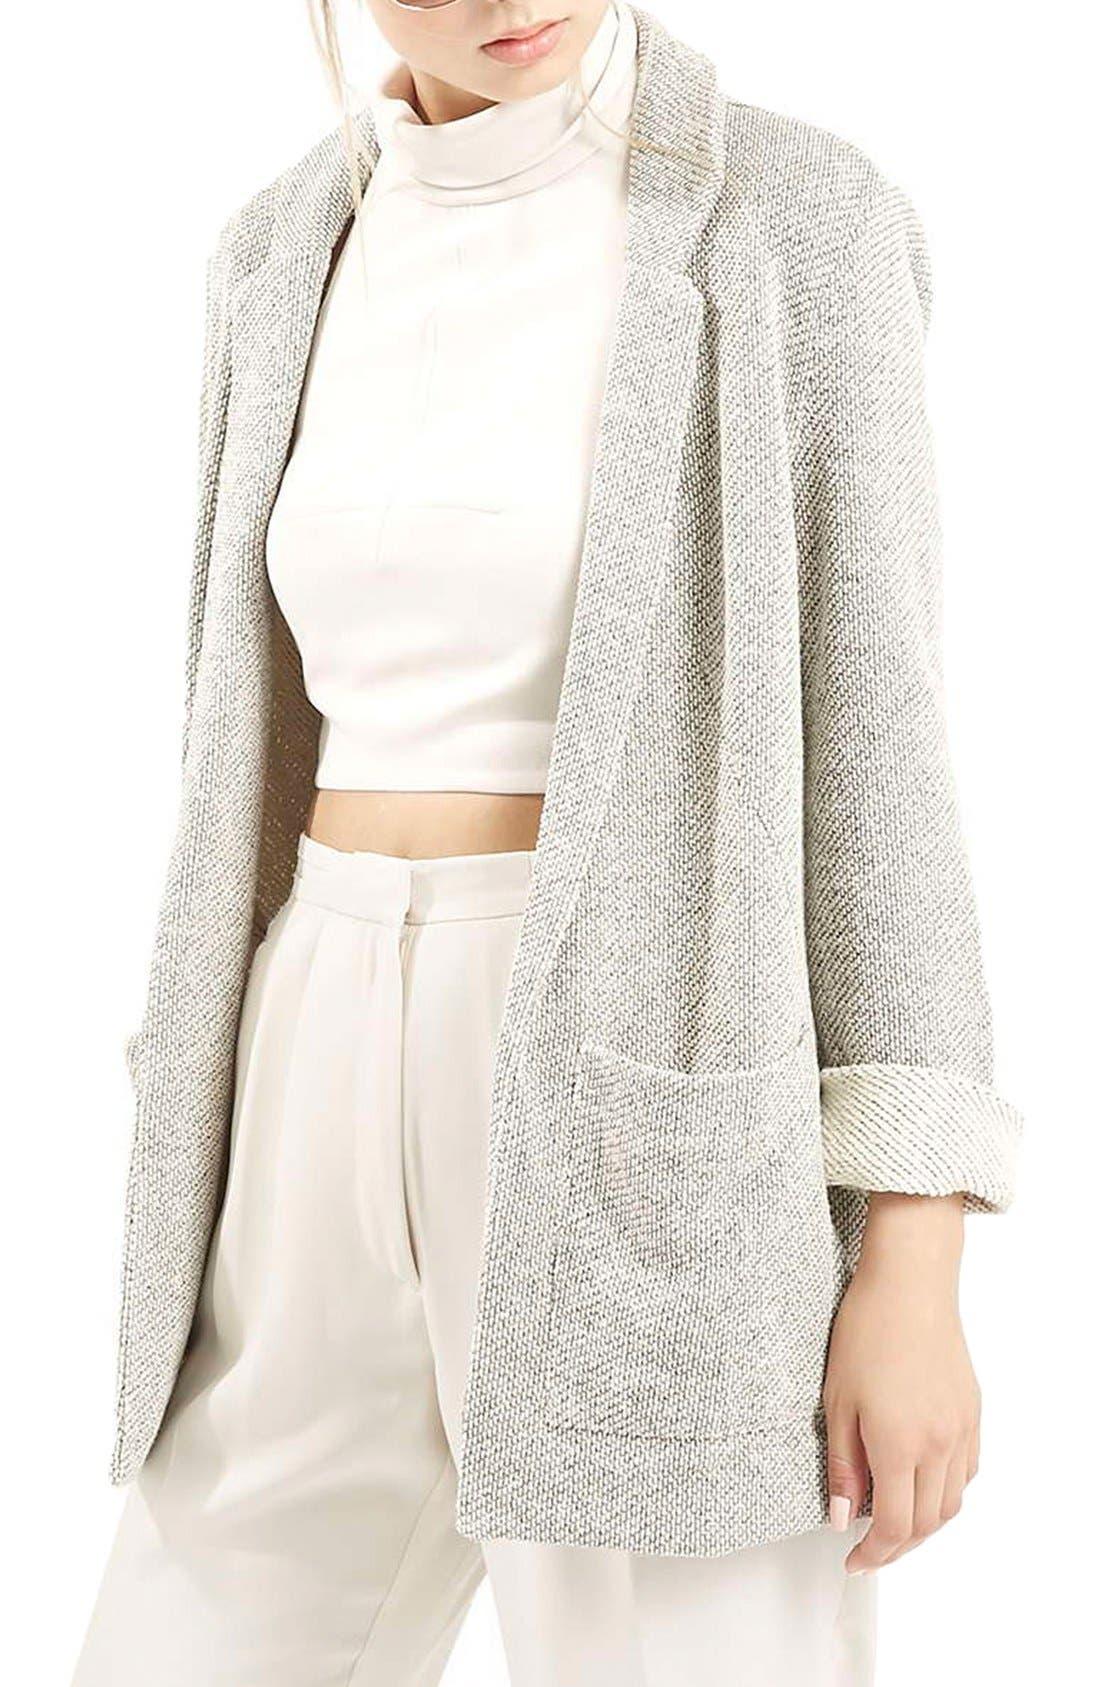 Alternate Image 1 Selected - Topshop Knit Boyfriend Jacket